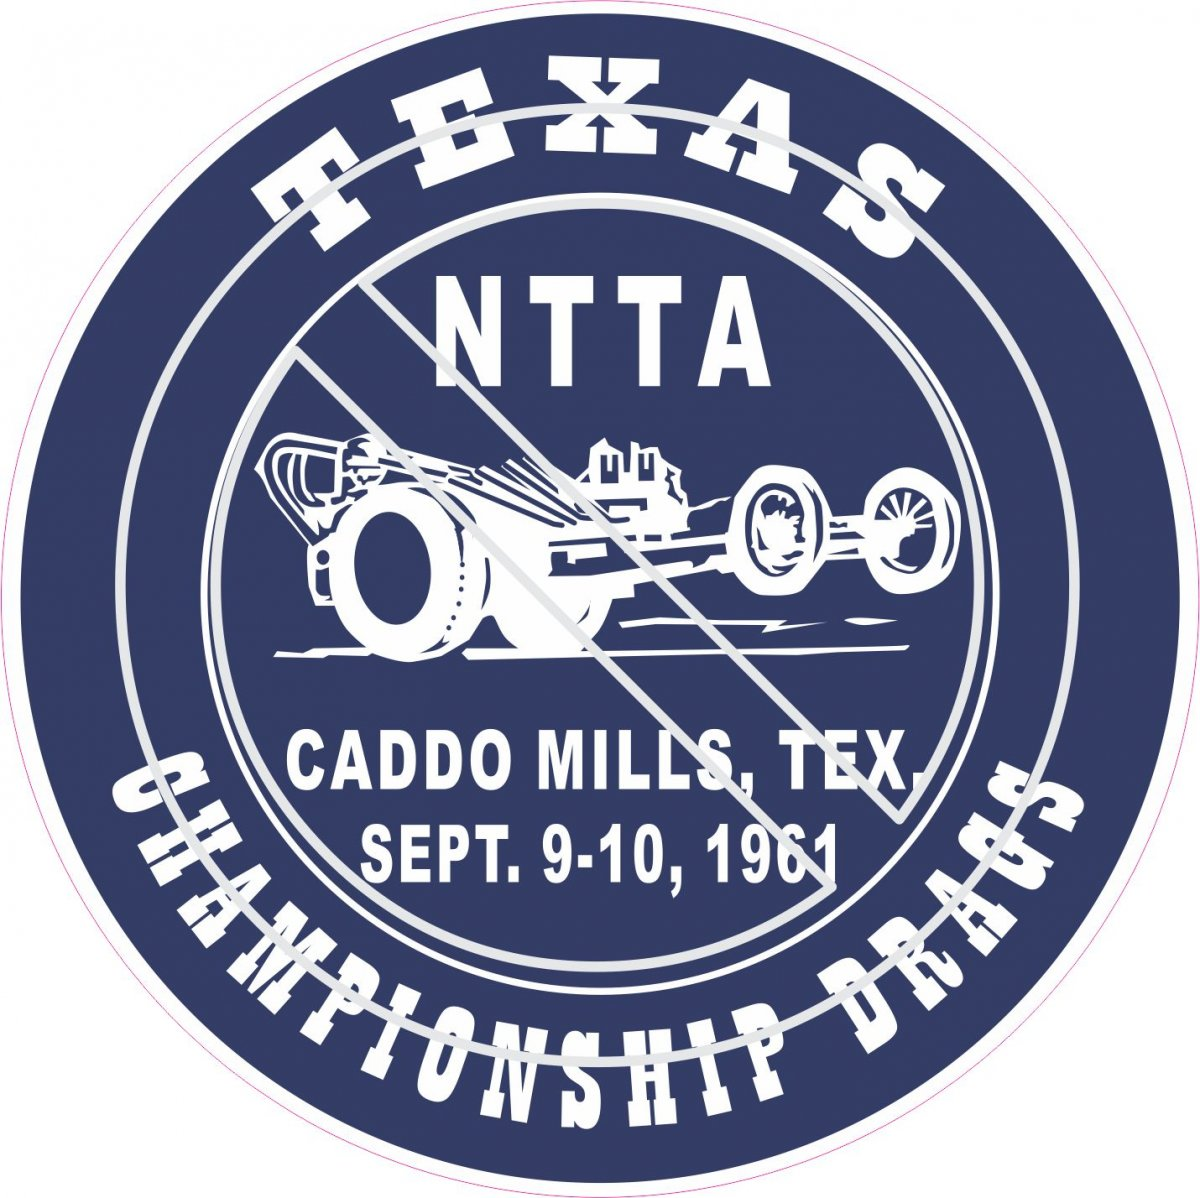 Texas Championship Drags 1961 Caddo Mills Texas.jpg